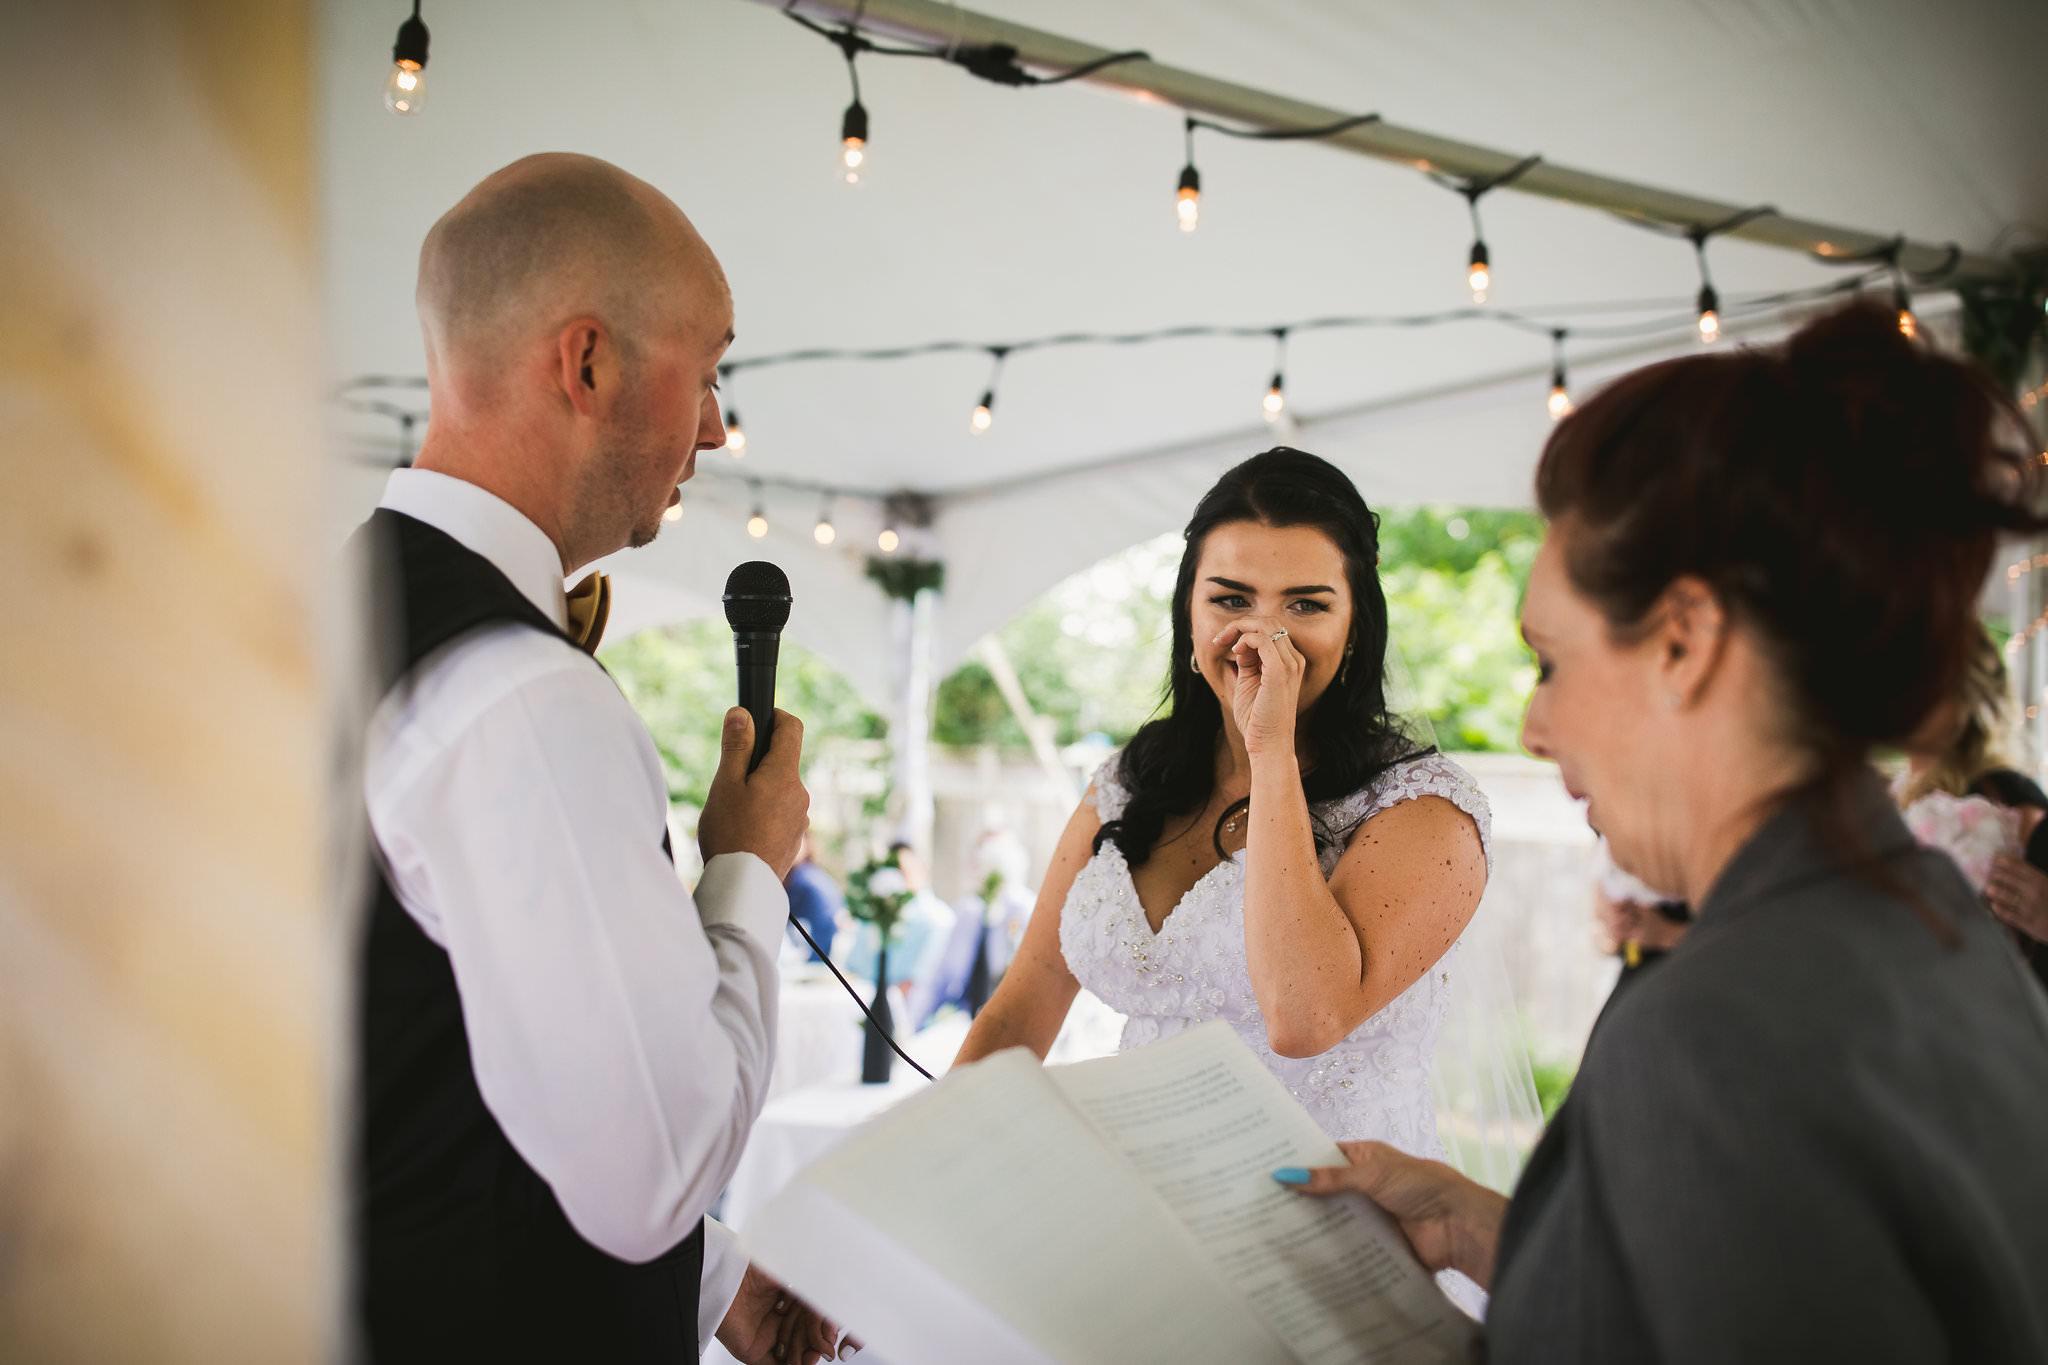 Kristen Adam Kindred Loft Whitby Wedding Photos 171 - Durham Wedding Photographer: Kindred Loft Wedding Photos